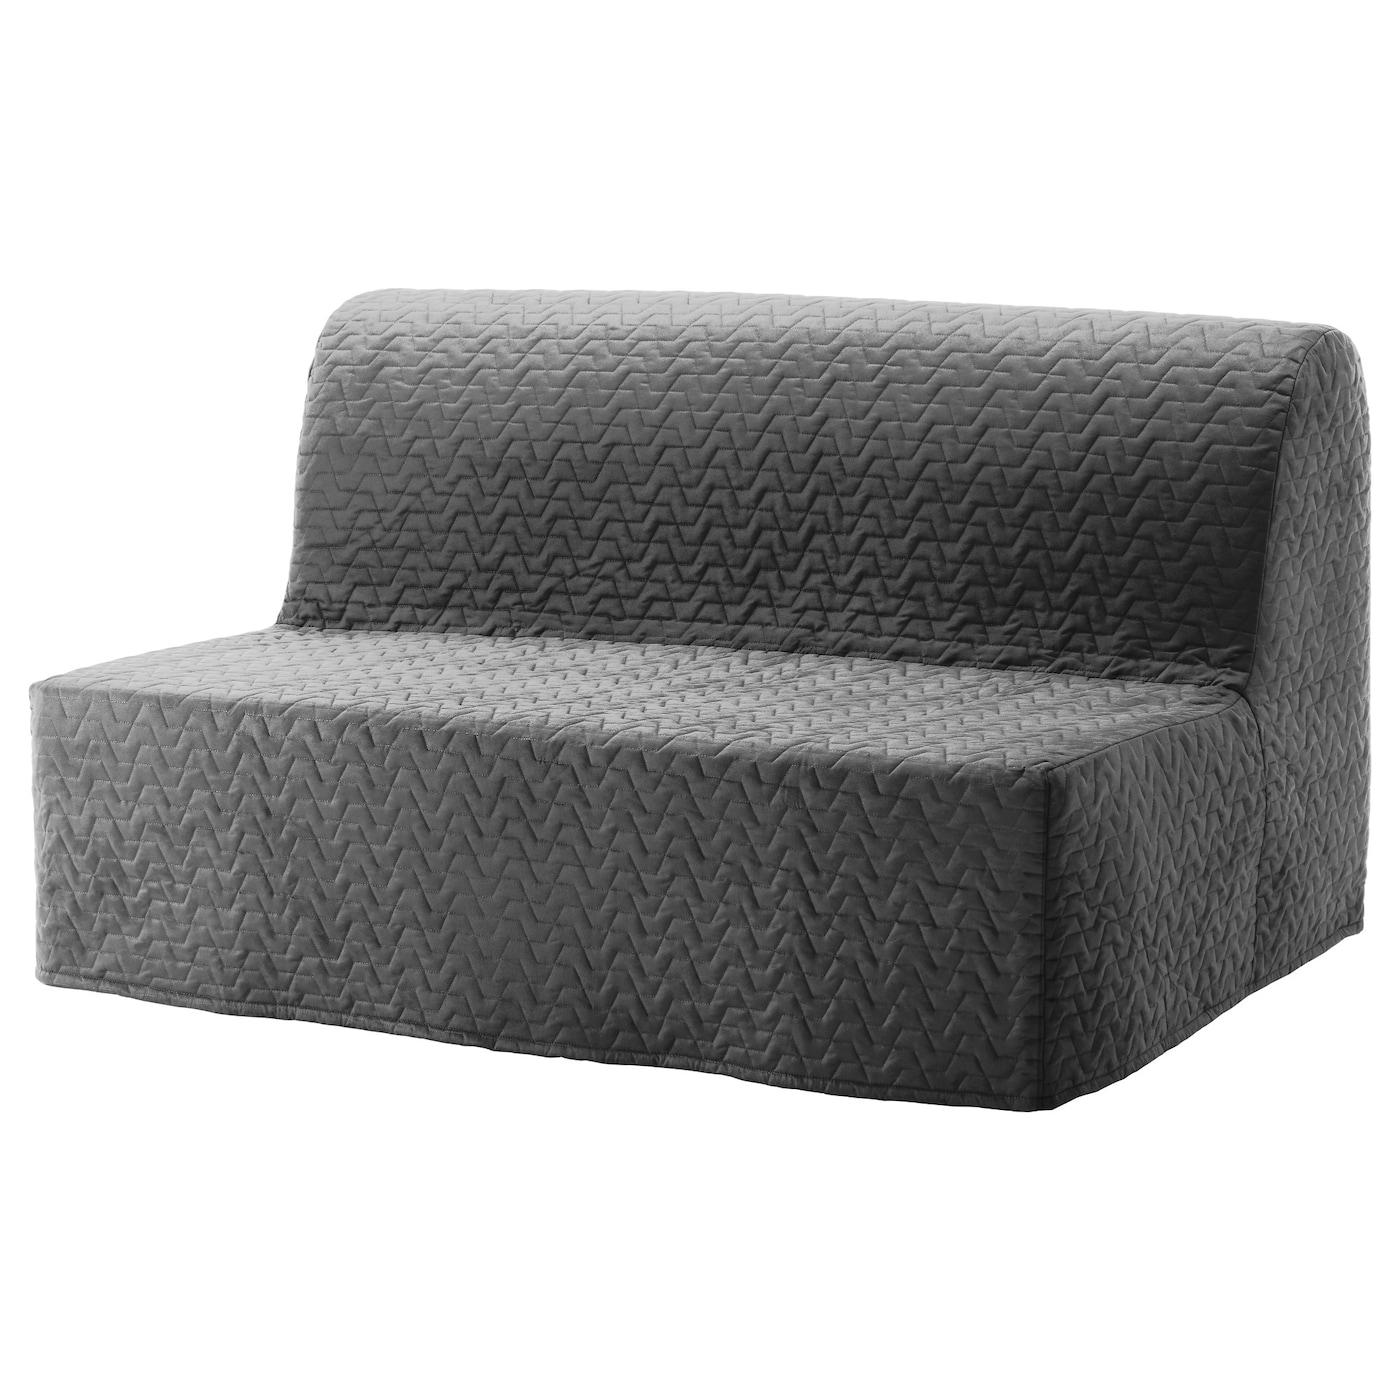 Lycksele Murbo Two Seat Sofa Bed